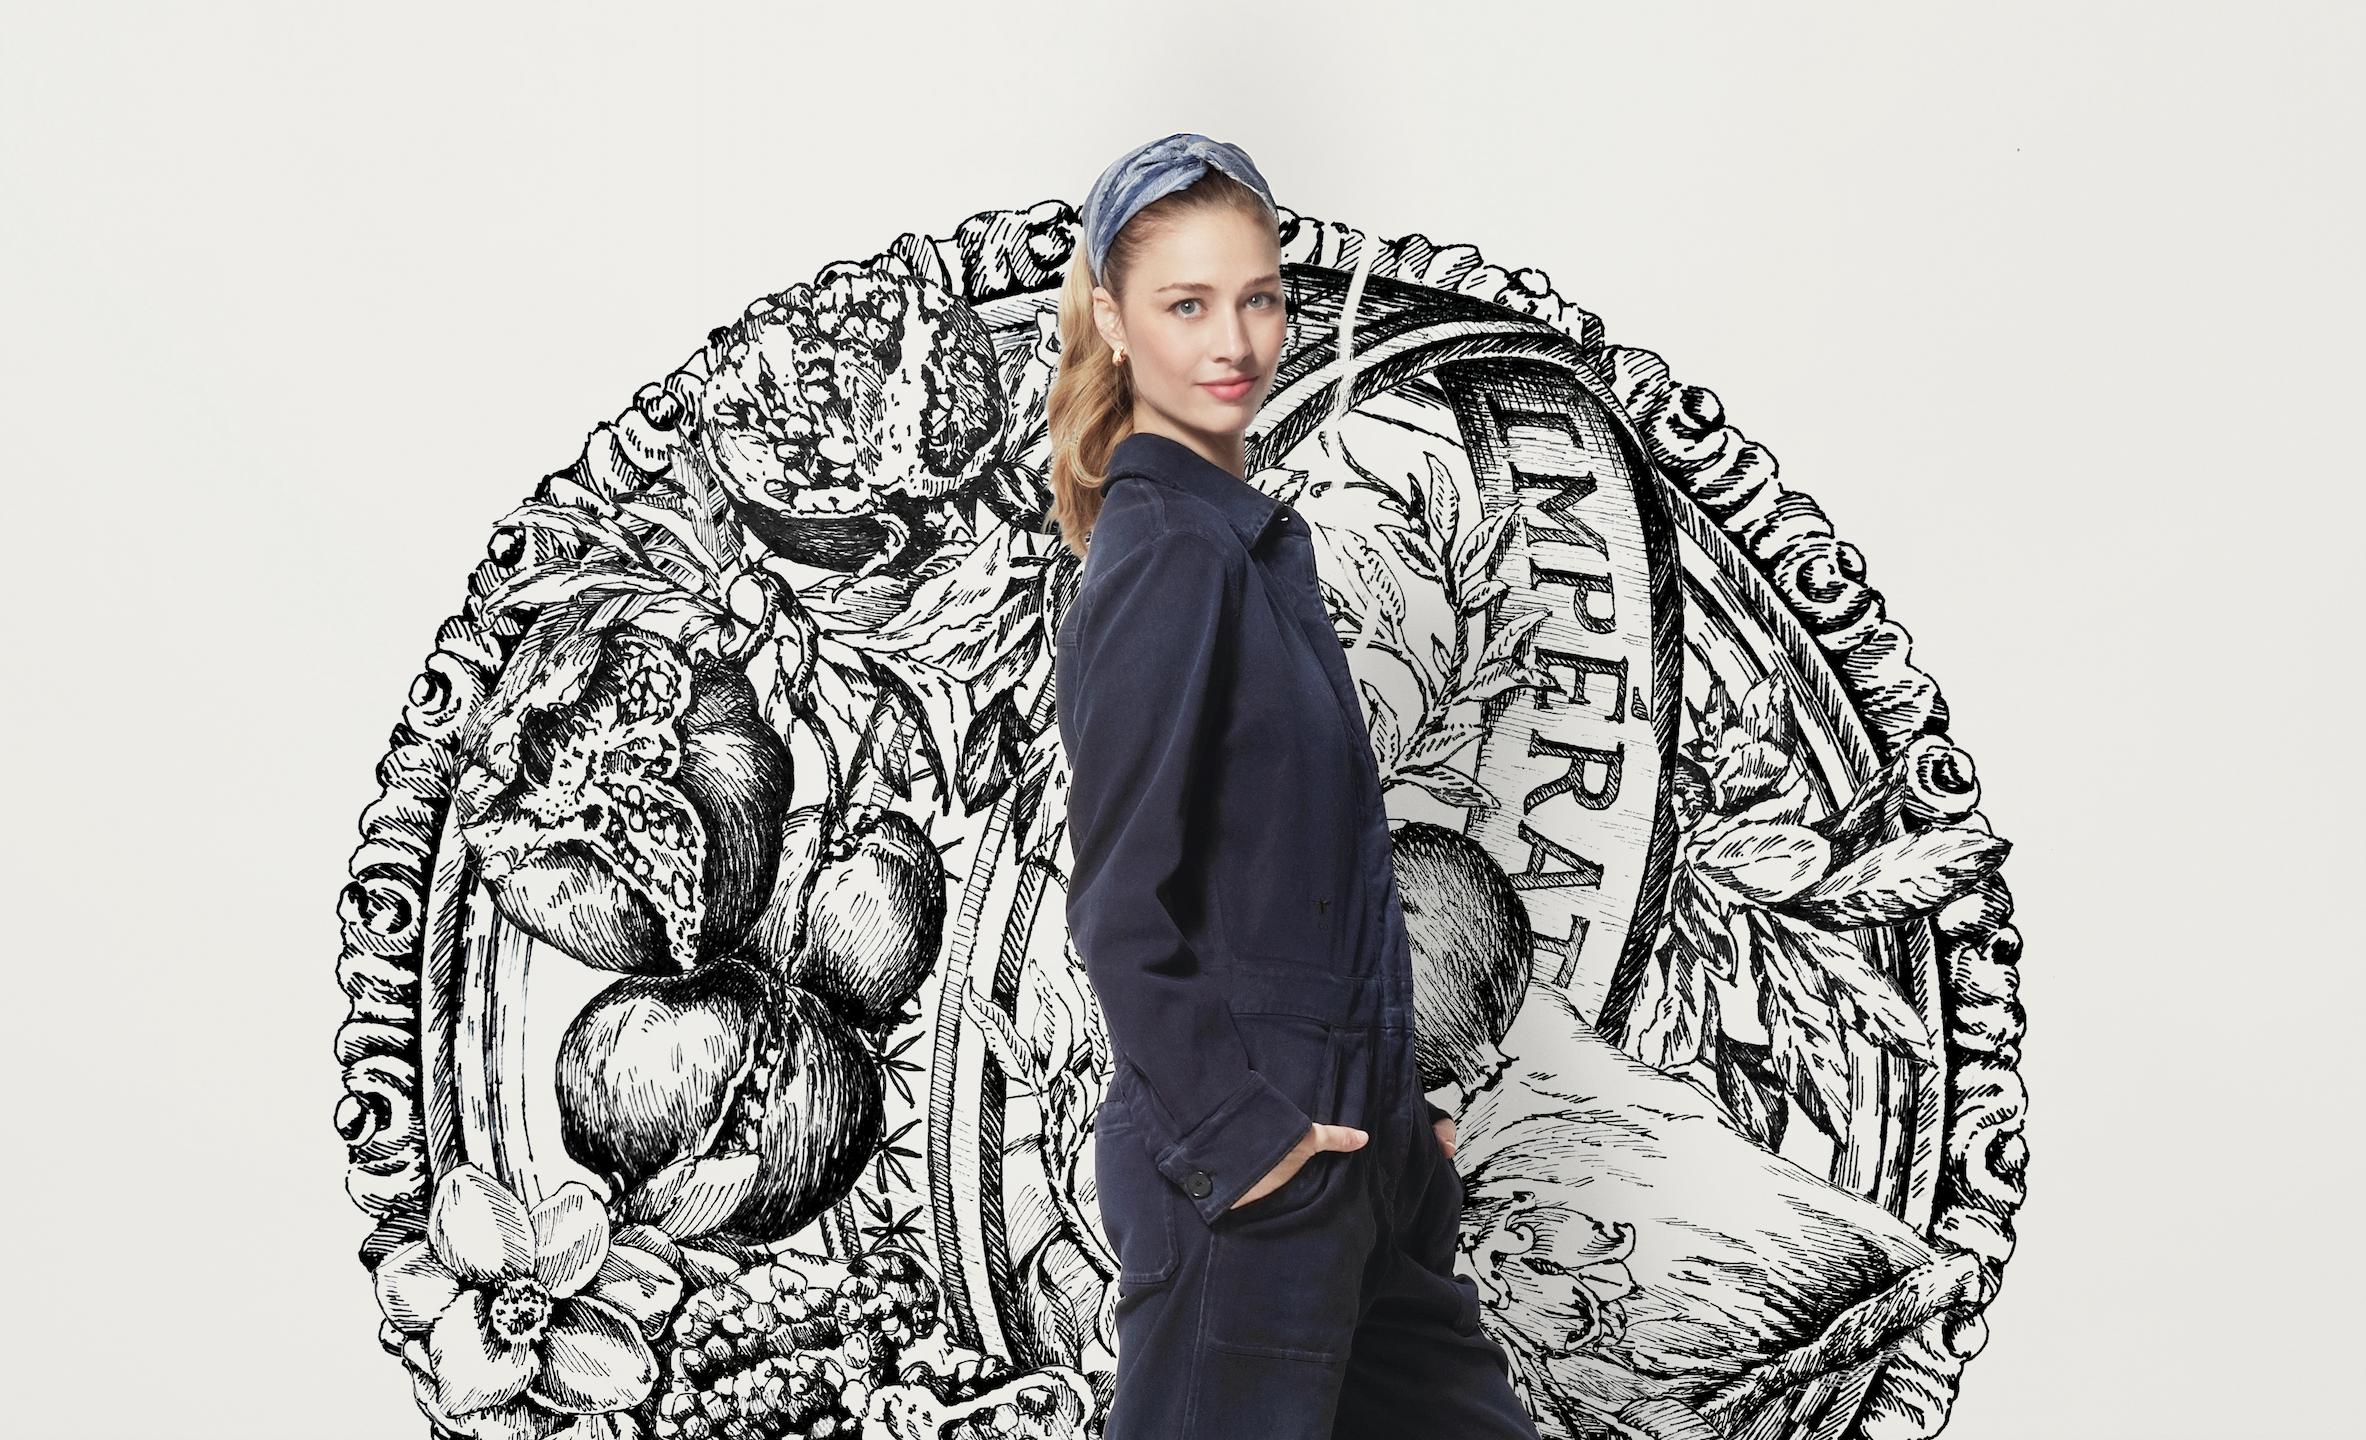 Beatrice Borromeo Casiraghi se convierte en embajadora de Dior